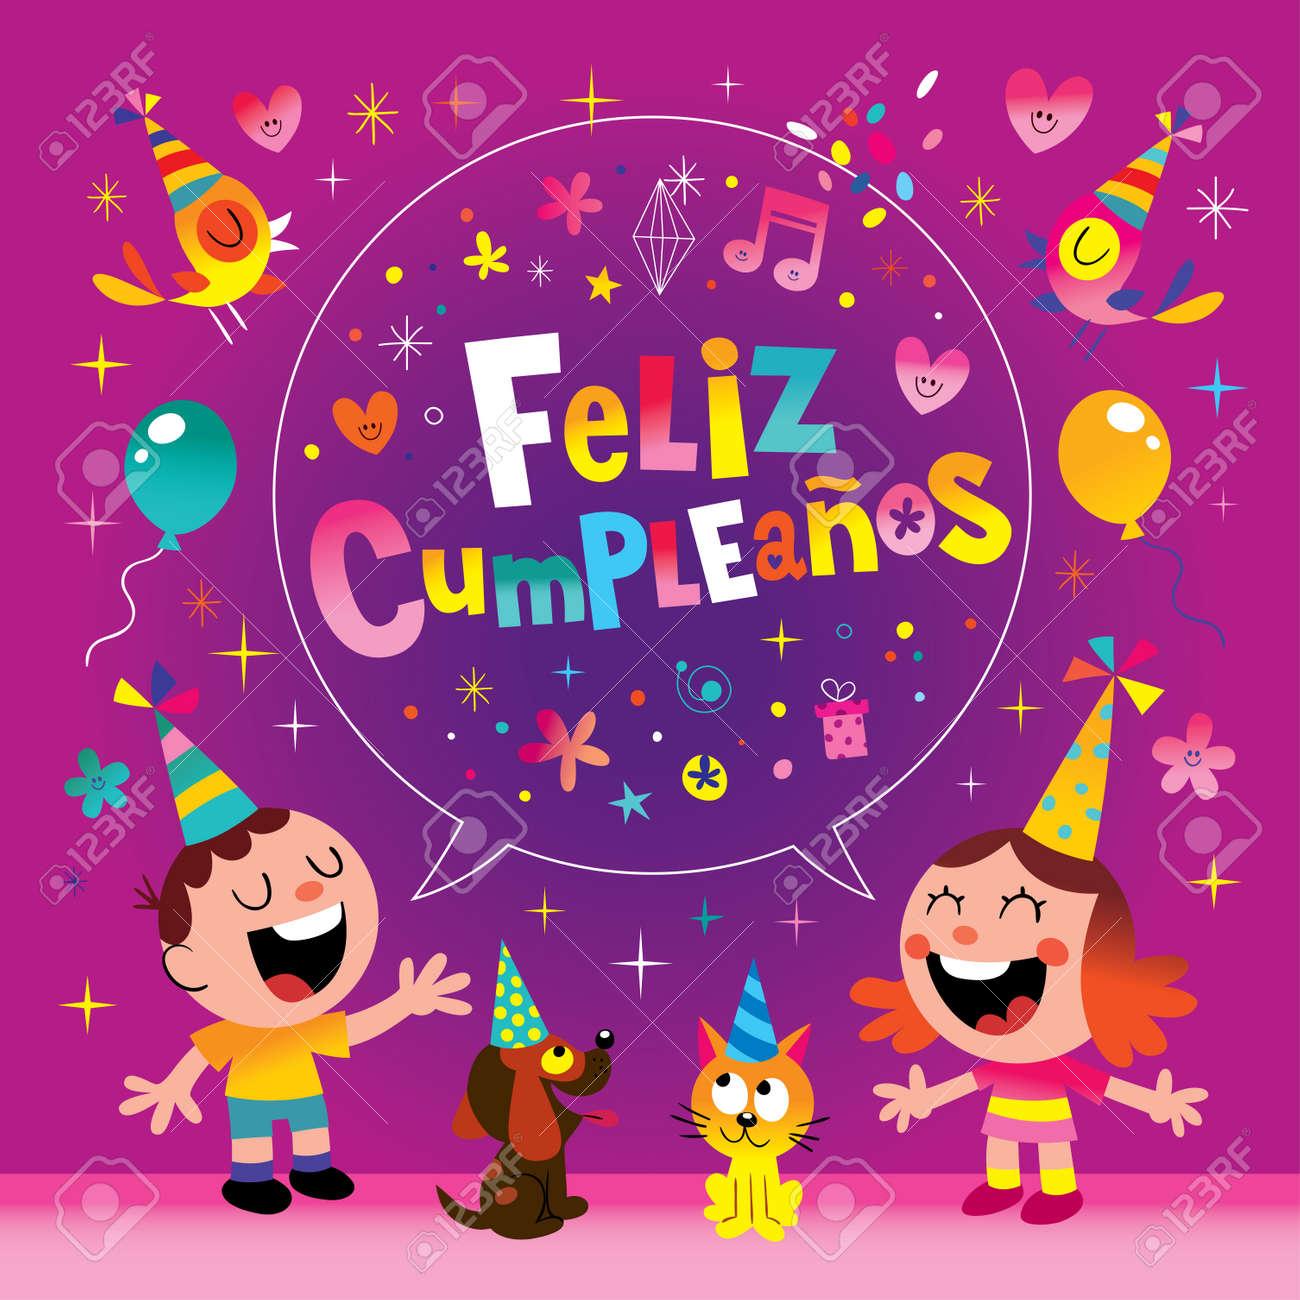 Feliz cumpleanos happy birthday in spanish kids greeting card feliz cumpleanos happy birthday in spanish kids greeting card stock vector 80251378 bookmarktalkfo Images